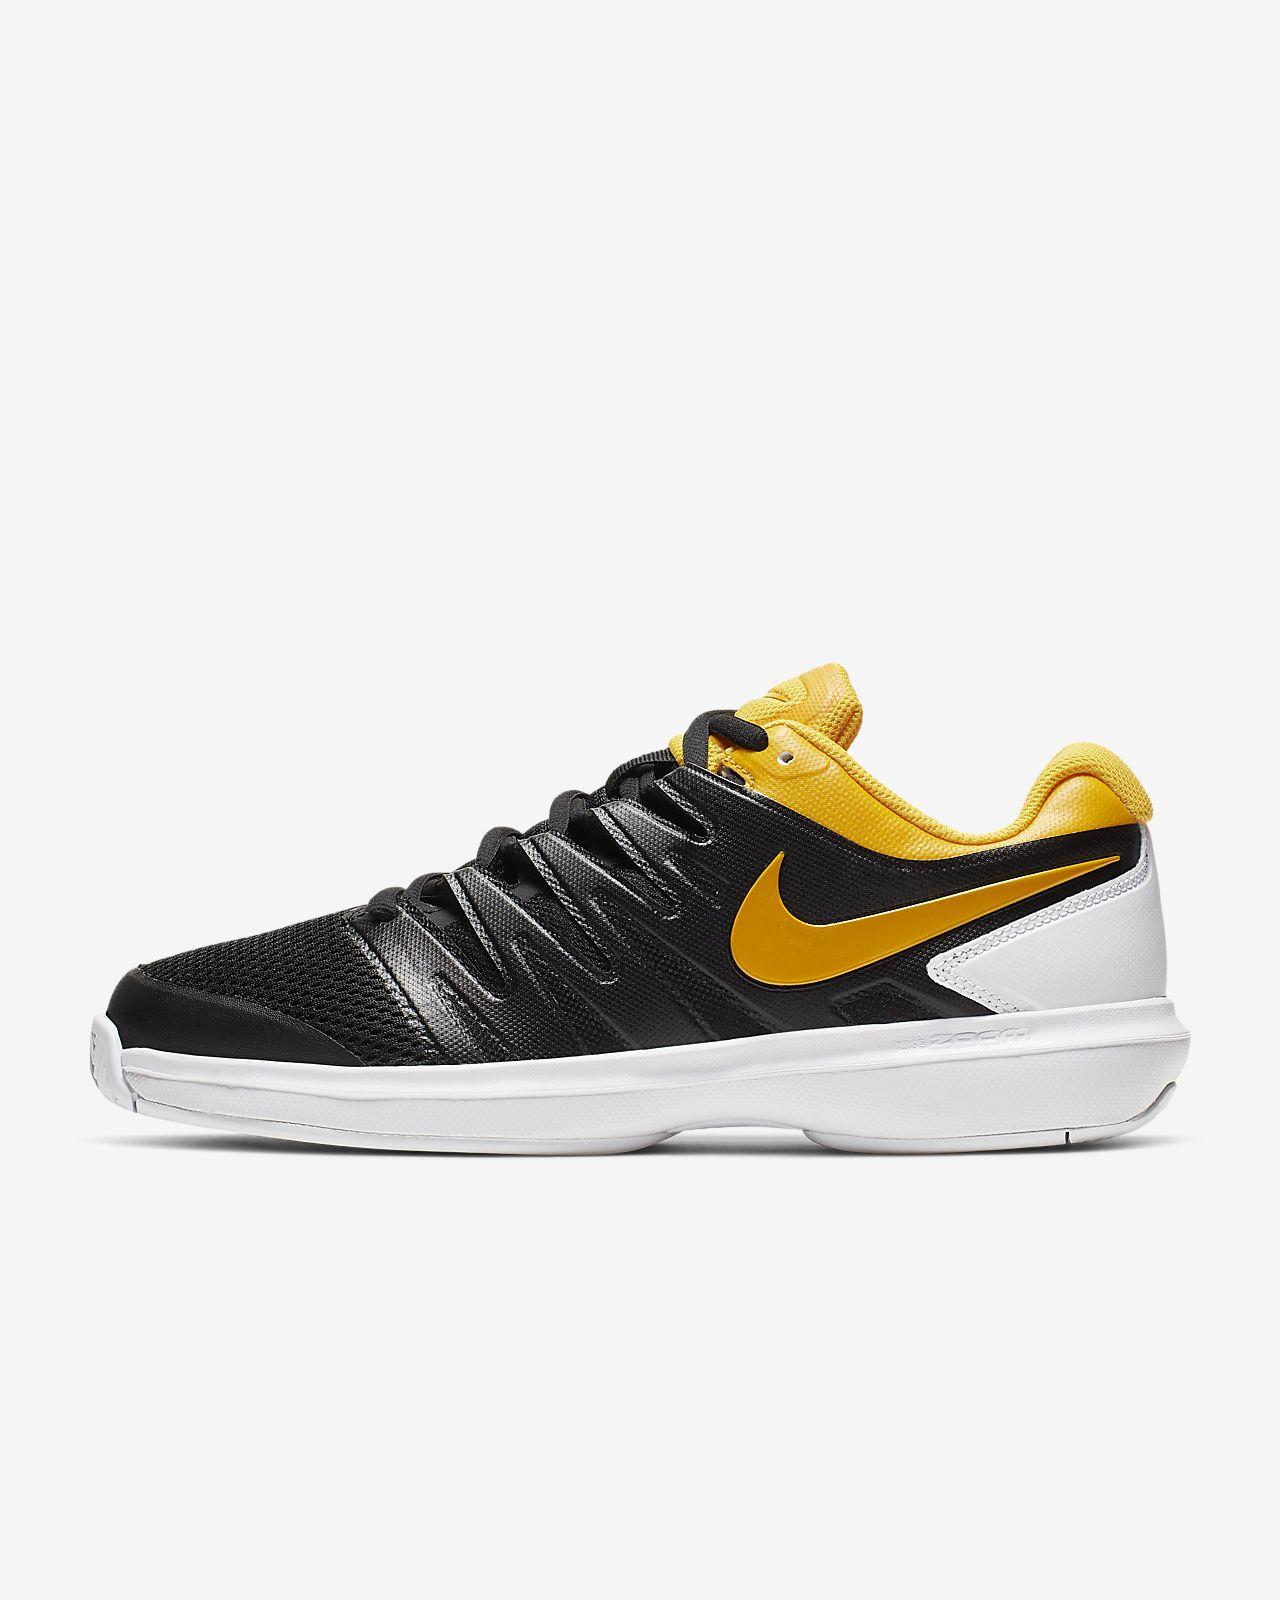 NikeCourt Air Zoom Prestige Men's Hard Court Tennis Shoe